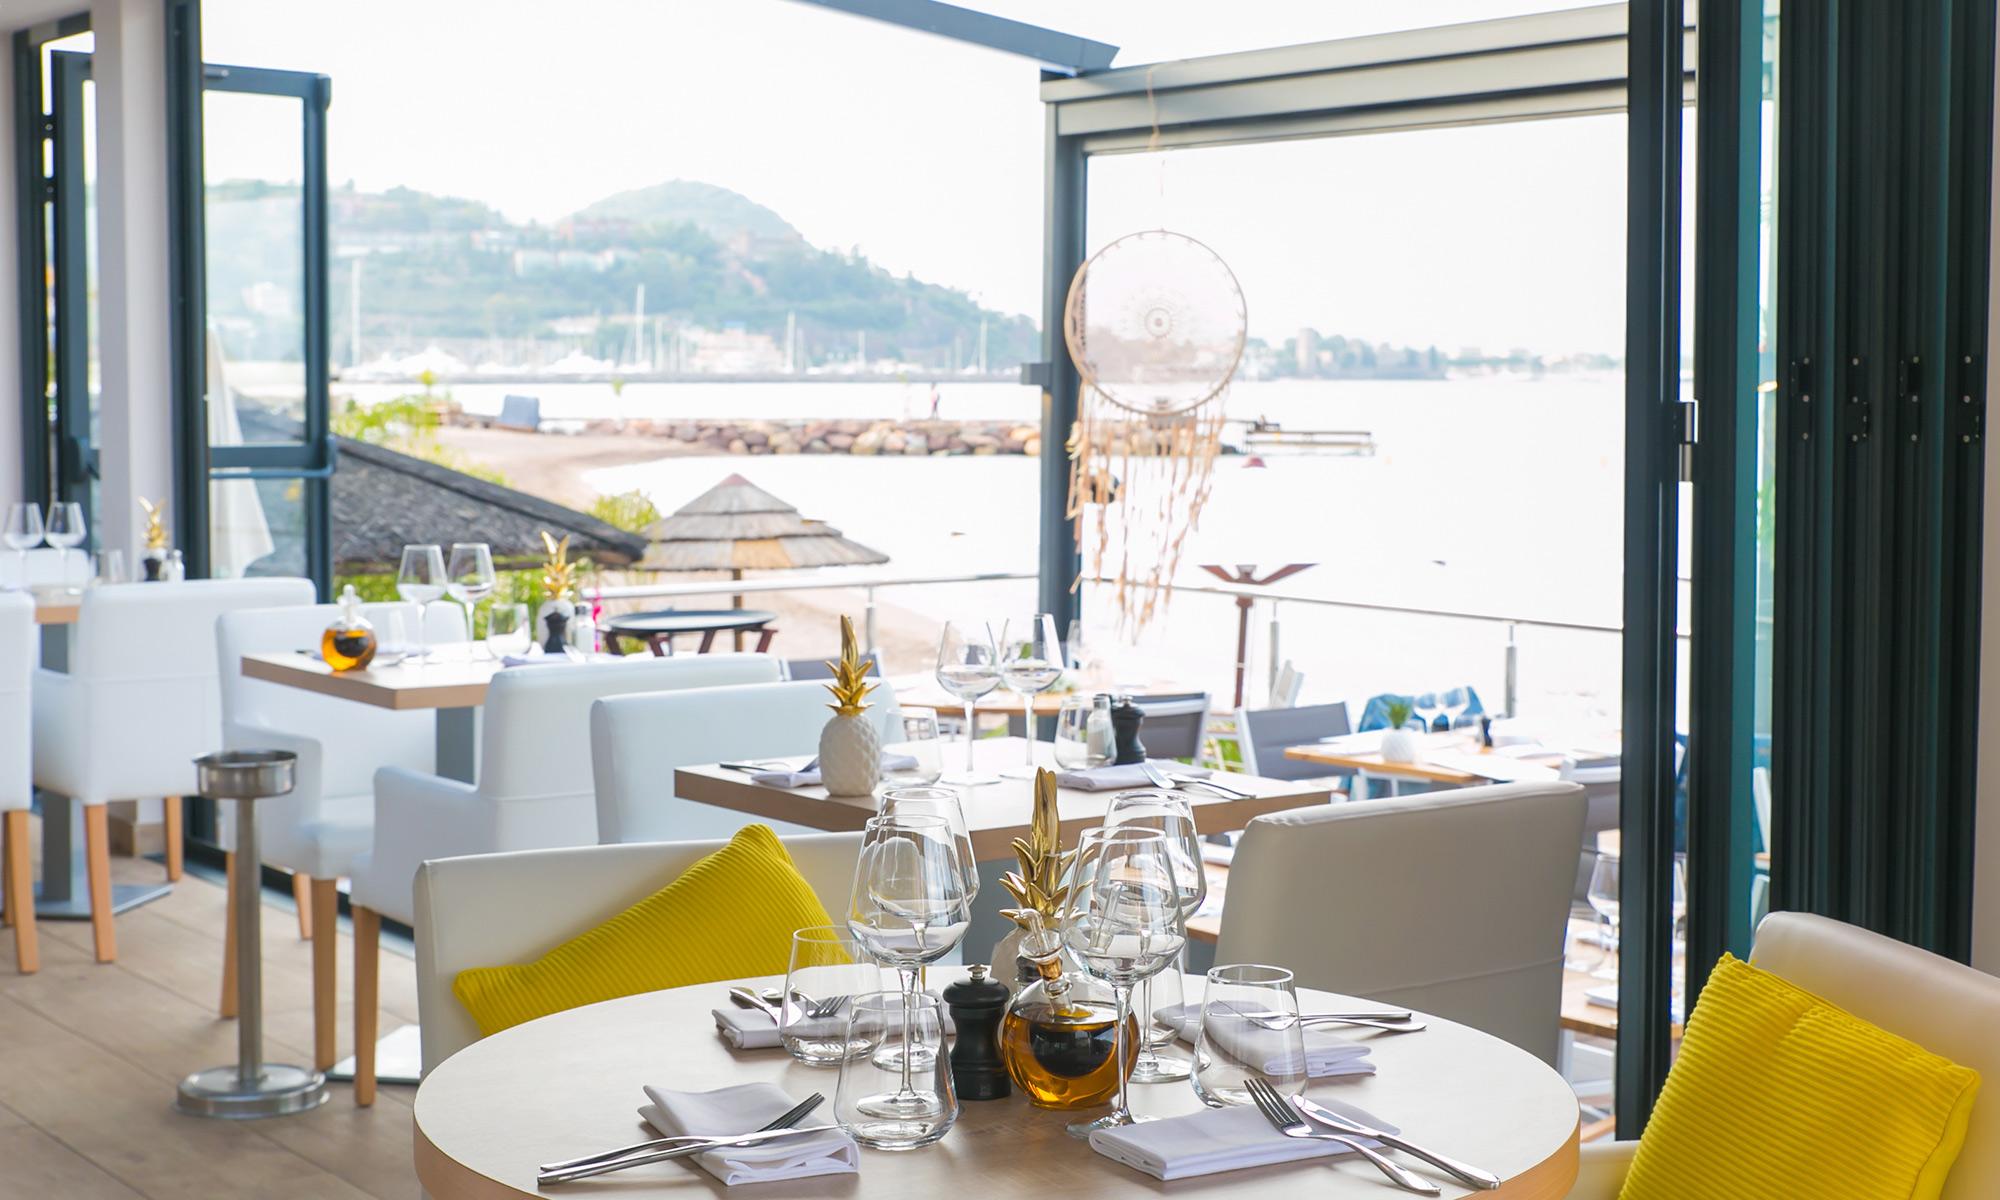 Plage Restaurant Theoule sur Mer